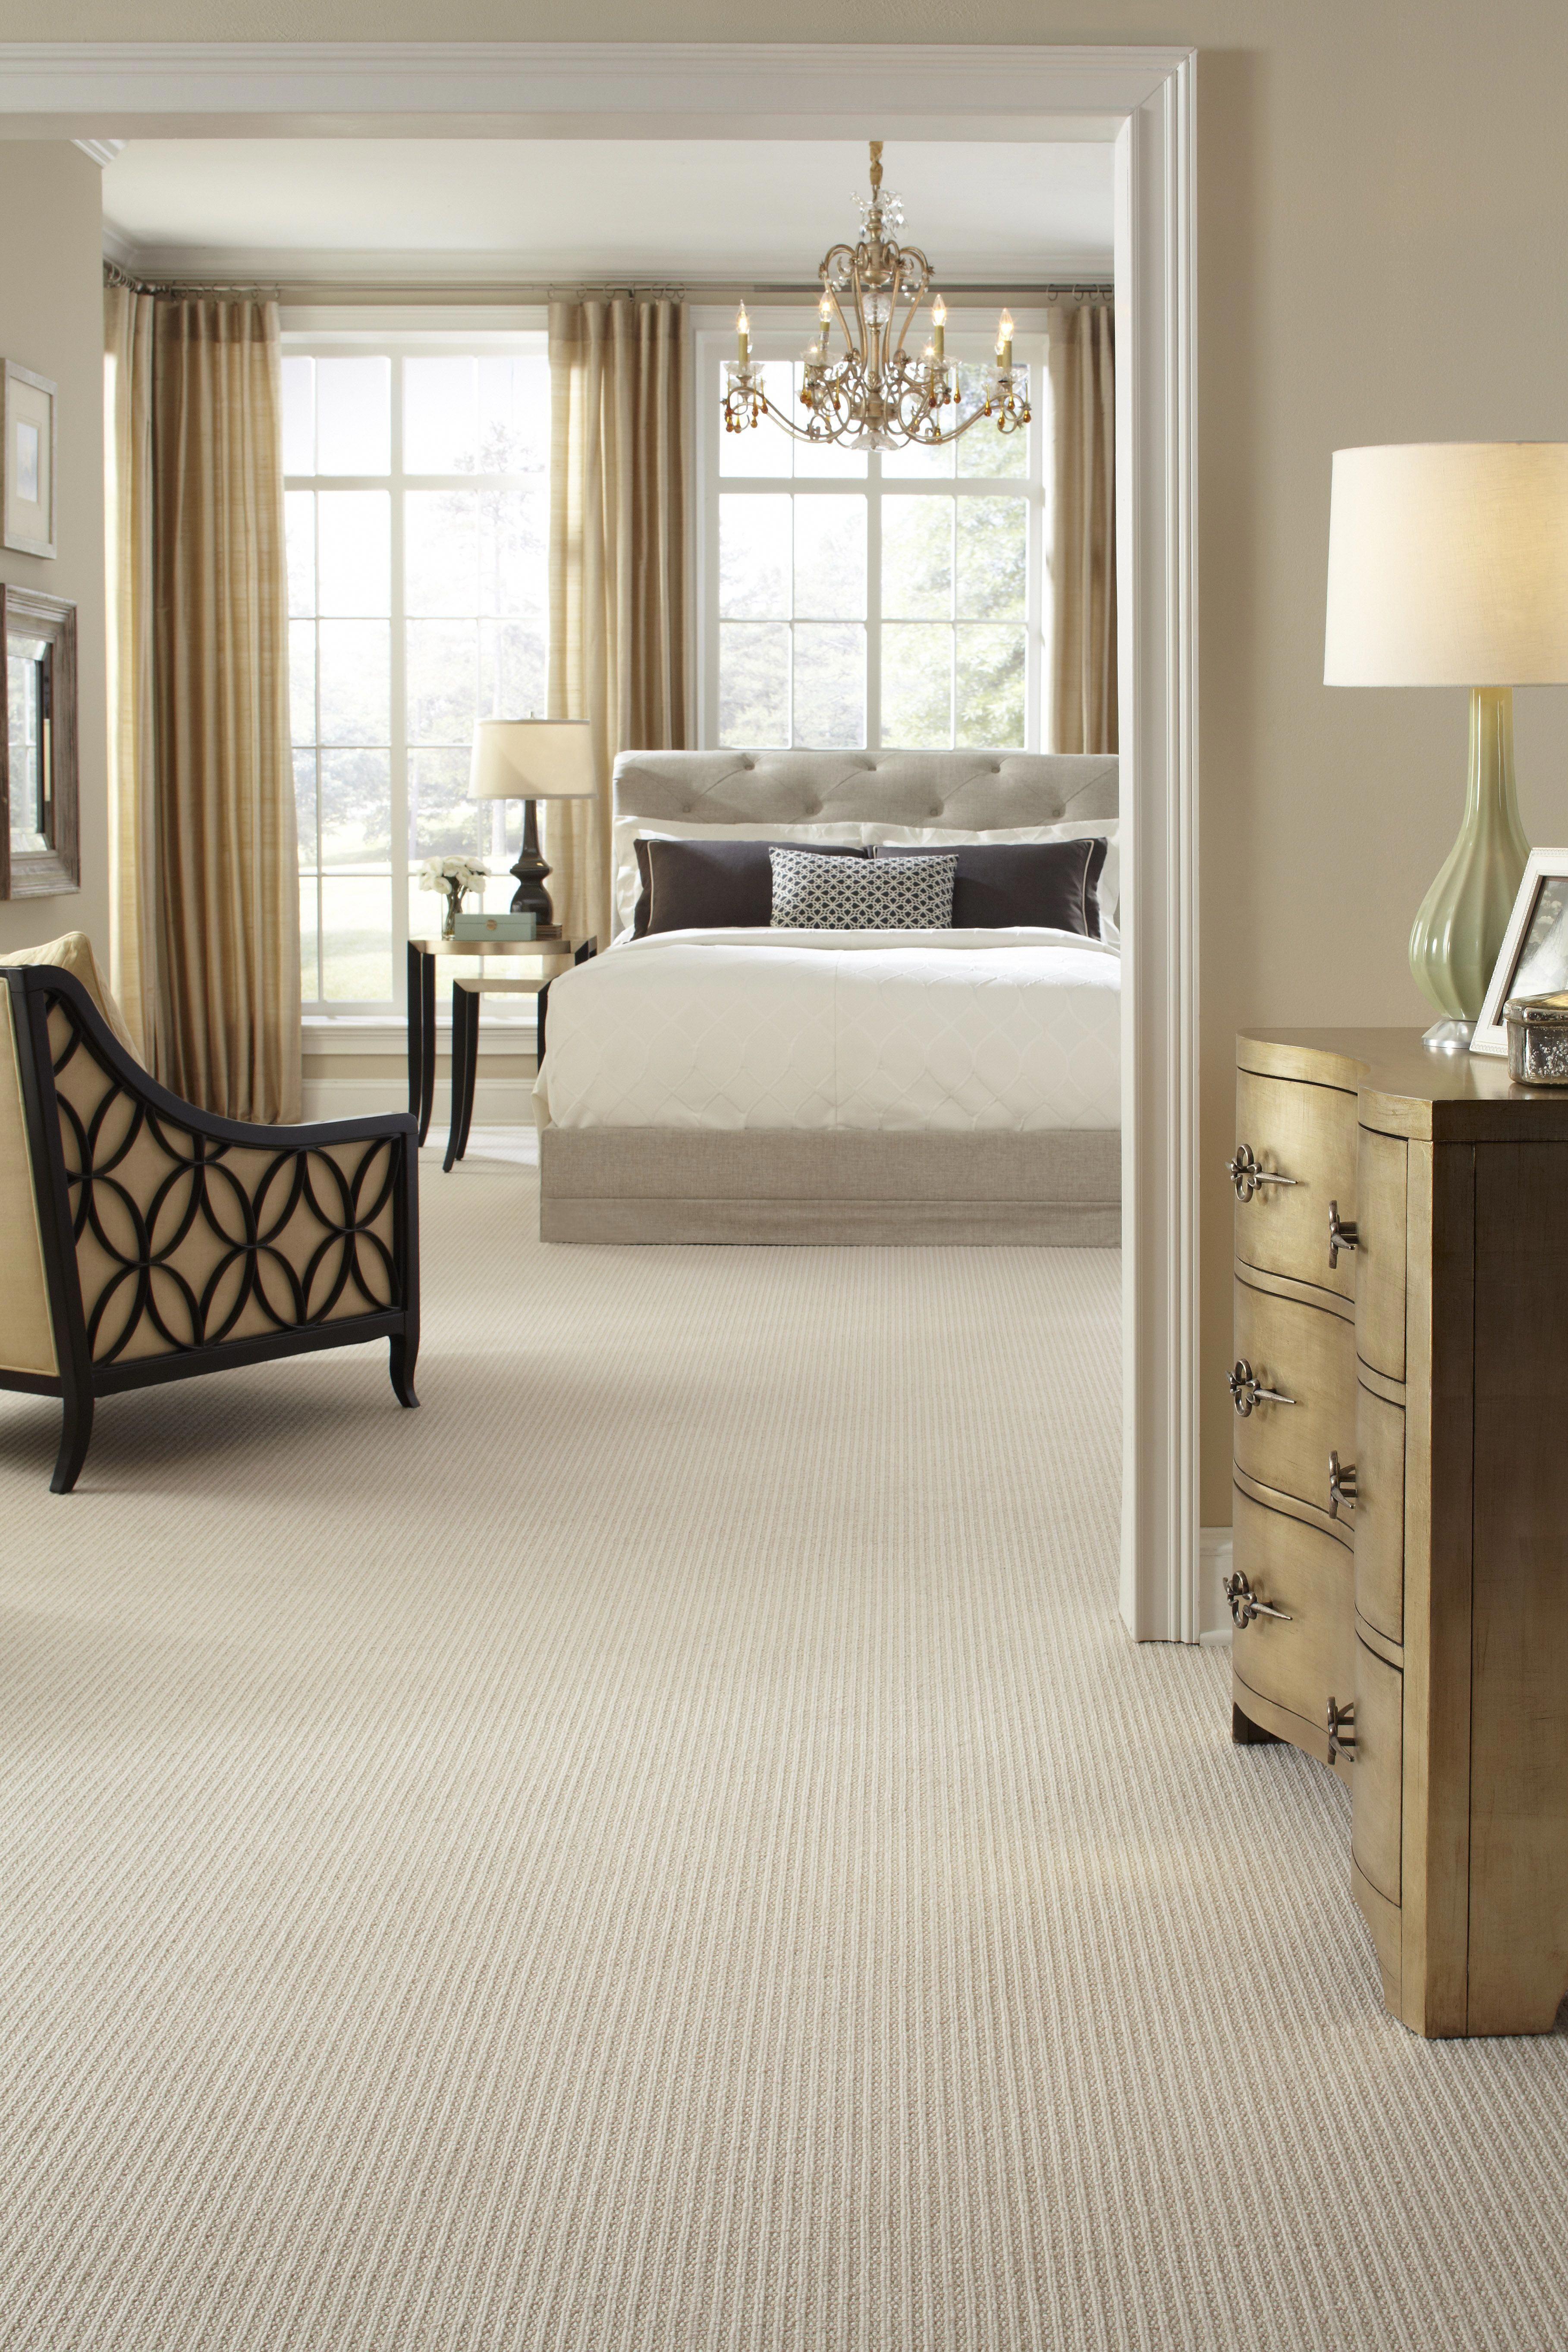 Cheap Carpet Runners For Hall in 2020 Bedroom carpet